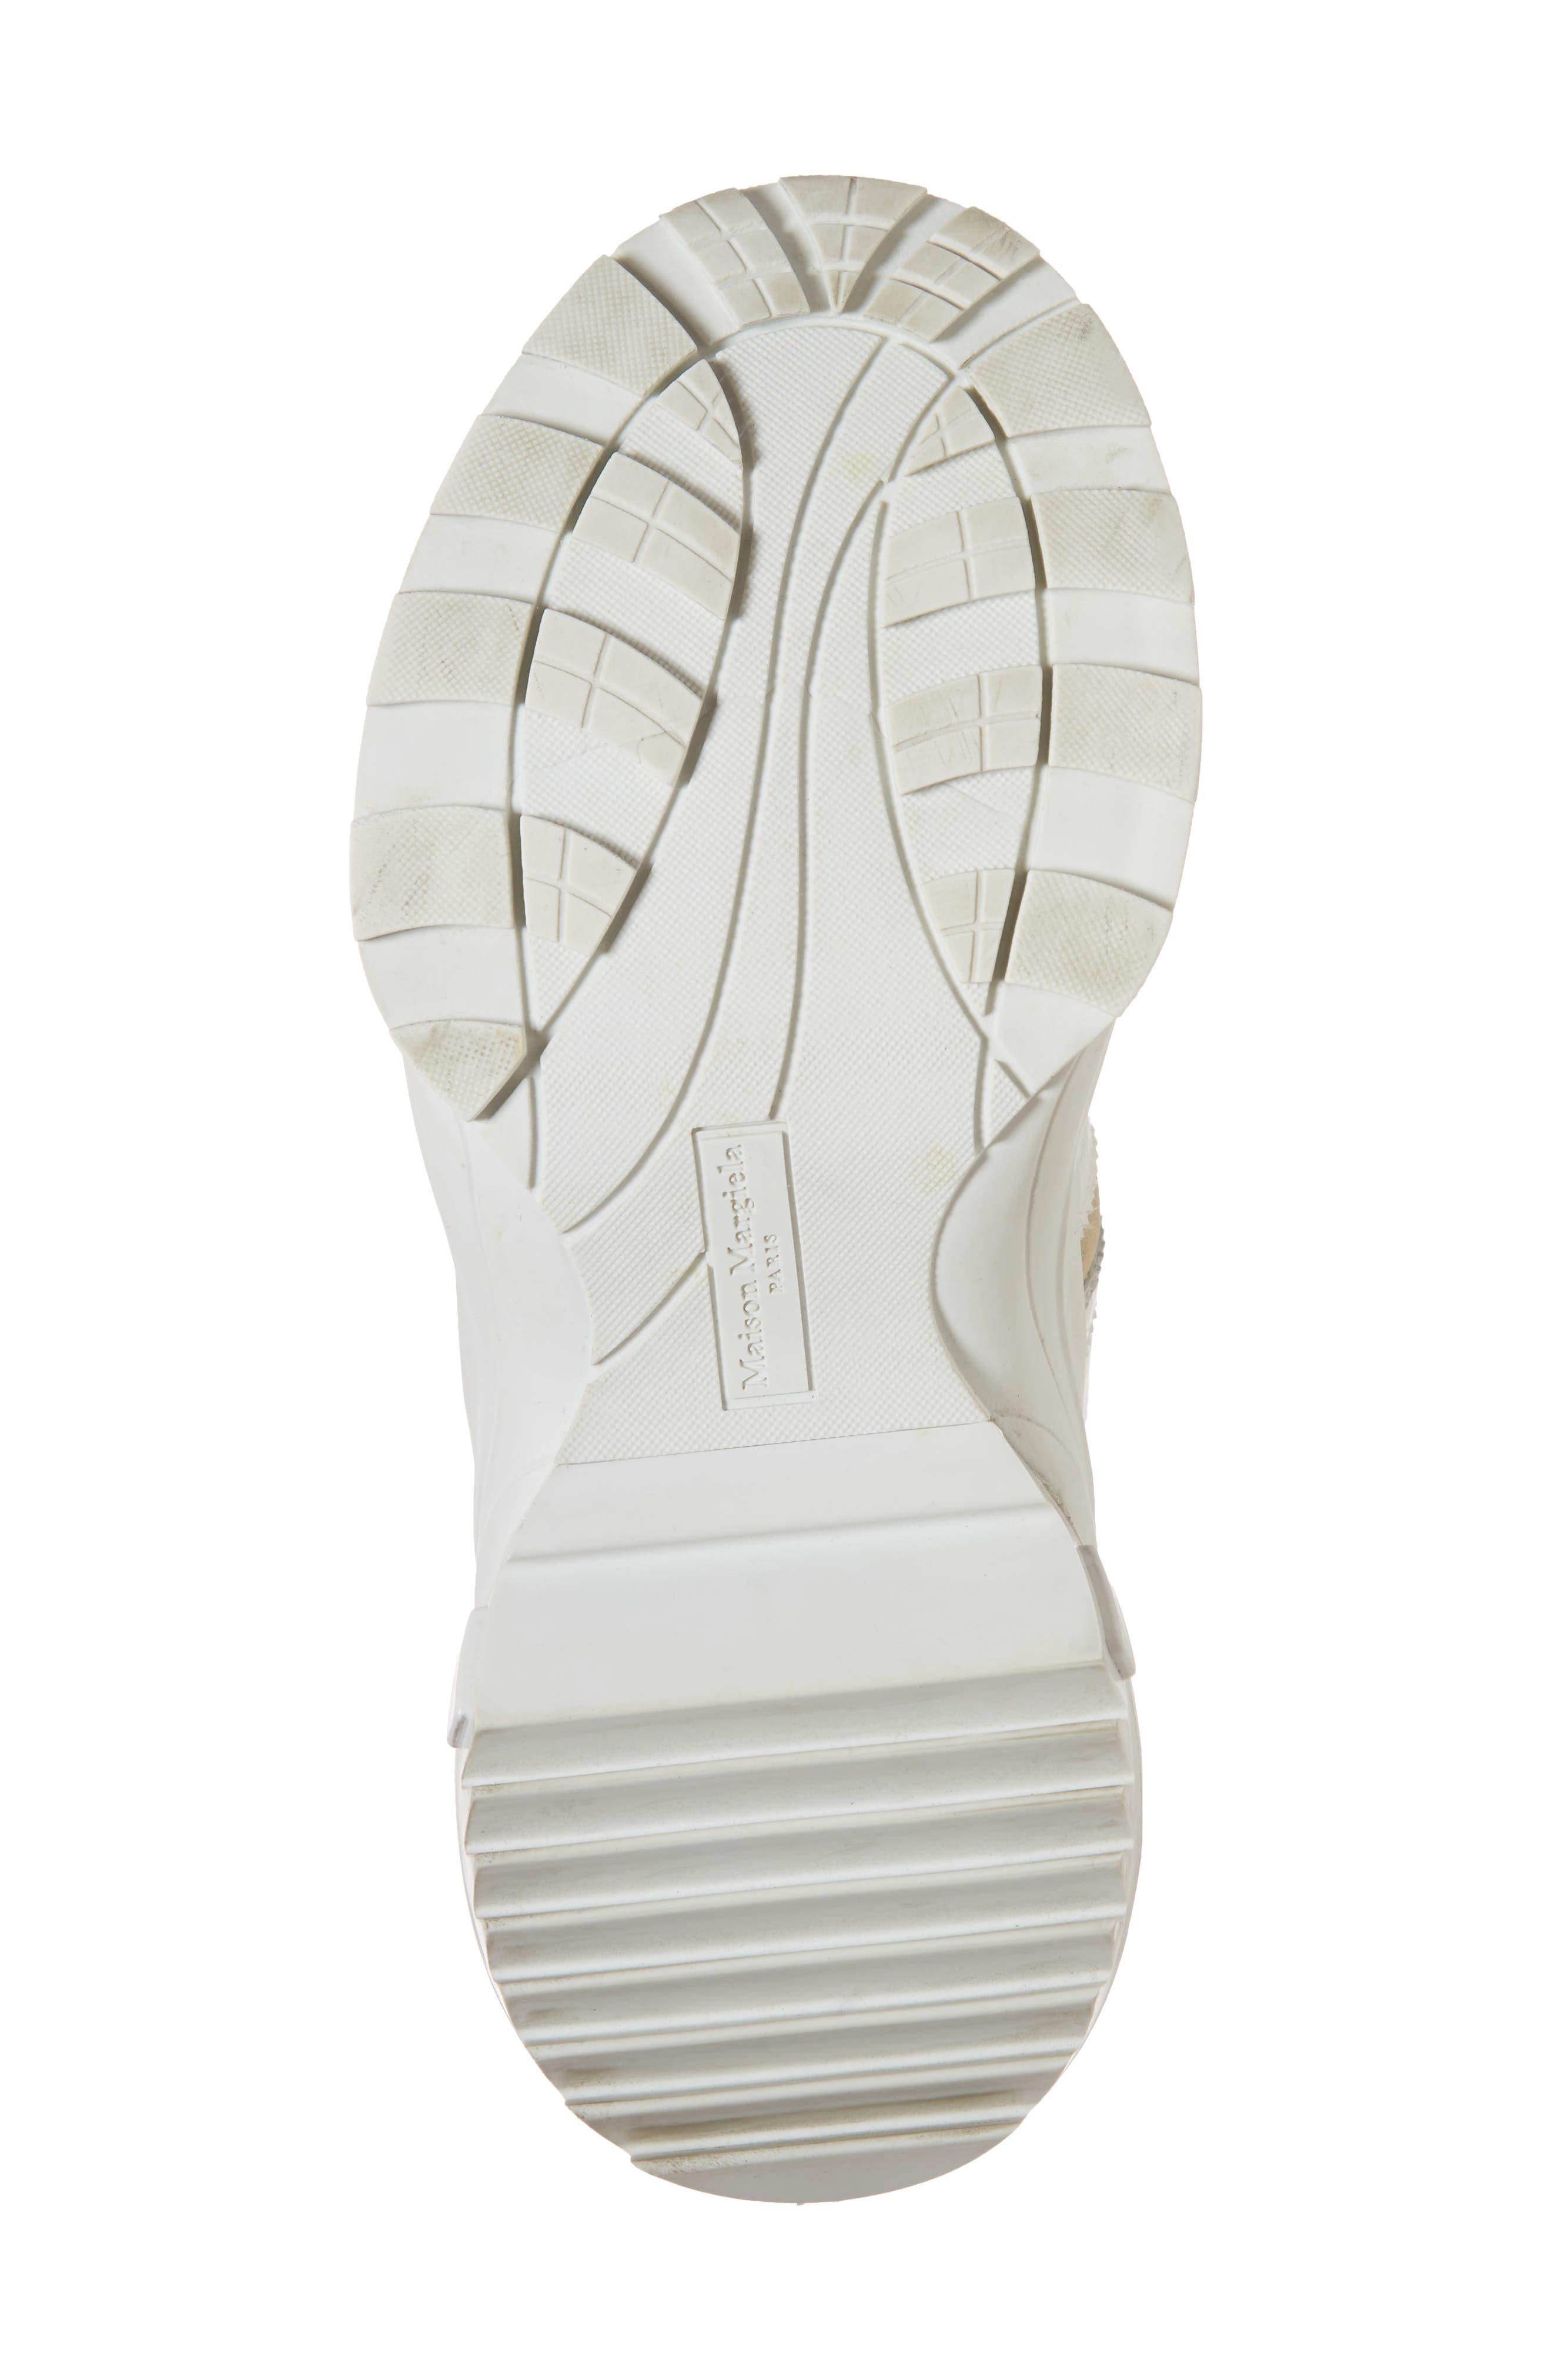 MAISON MARGIELA, Retro Fit Destroyed Sneaker, Alternate thumbnail 6, color, WHITE